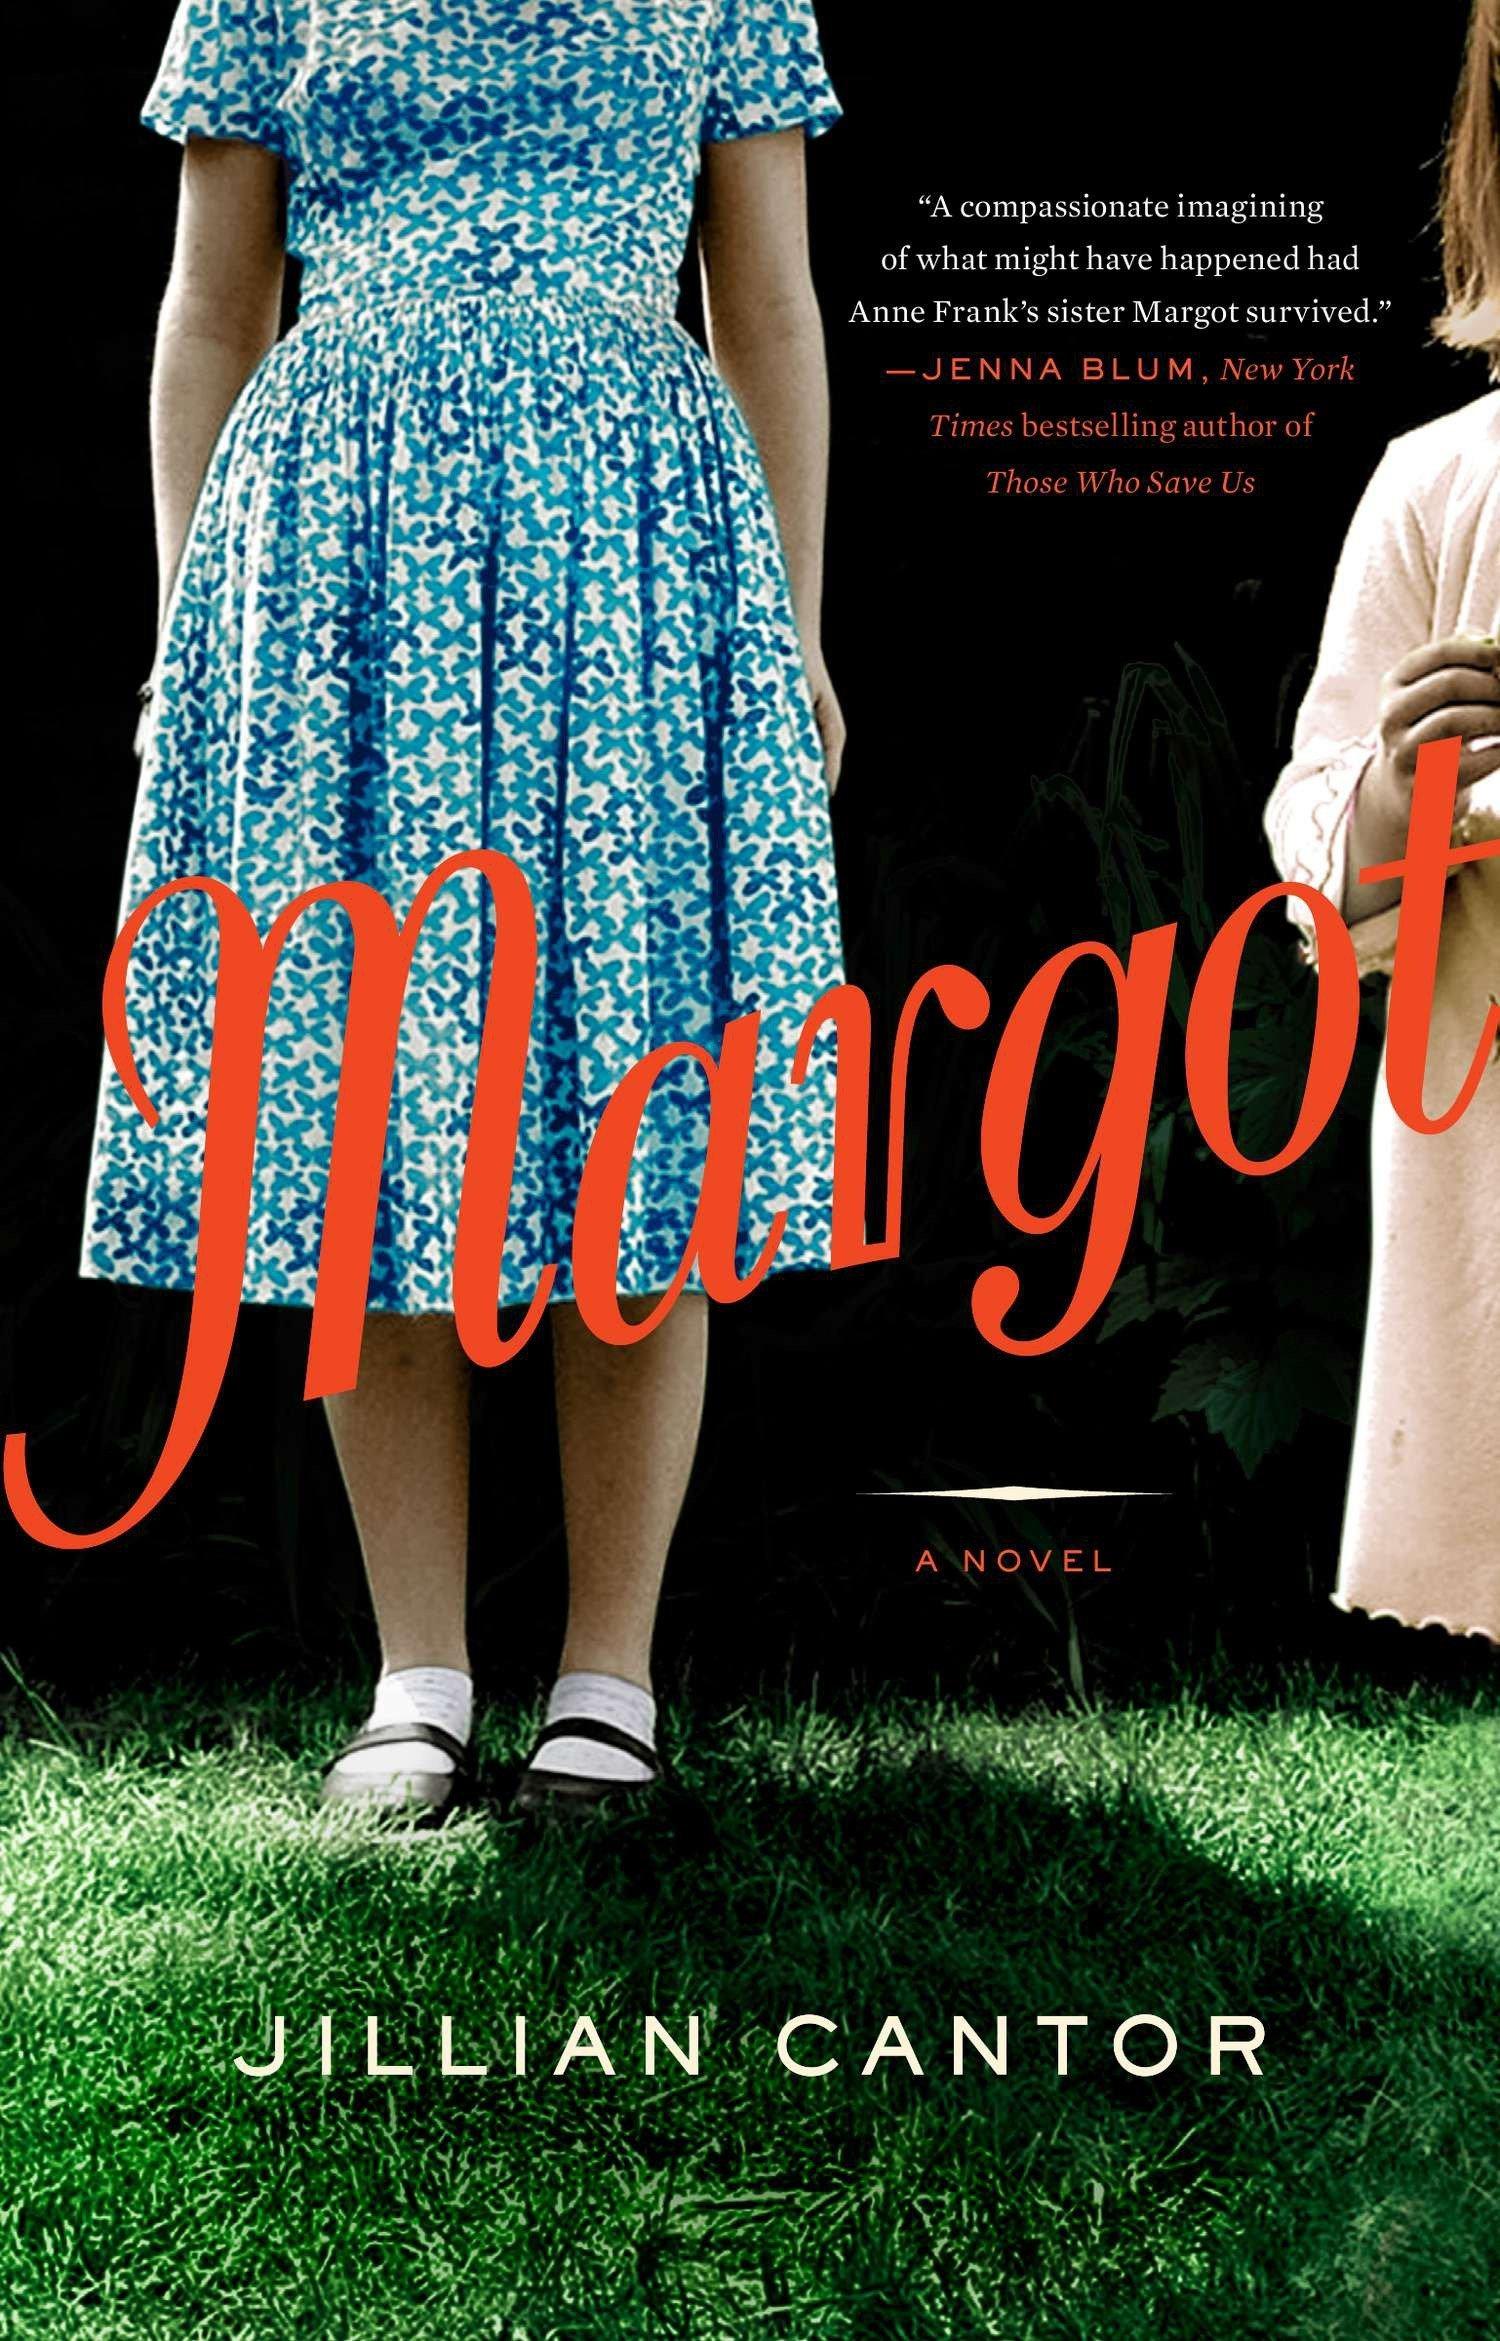 Amazon.com: Margot: a Novel (9781594486432): Jillian Cantor: Books